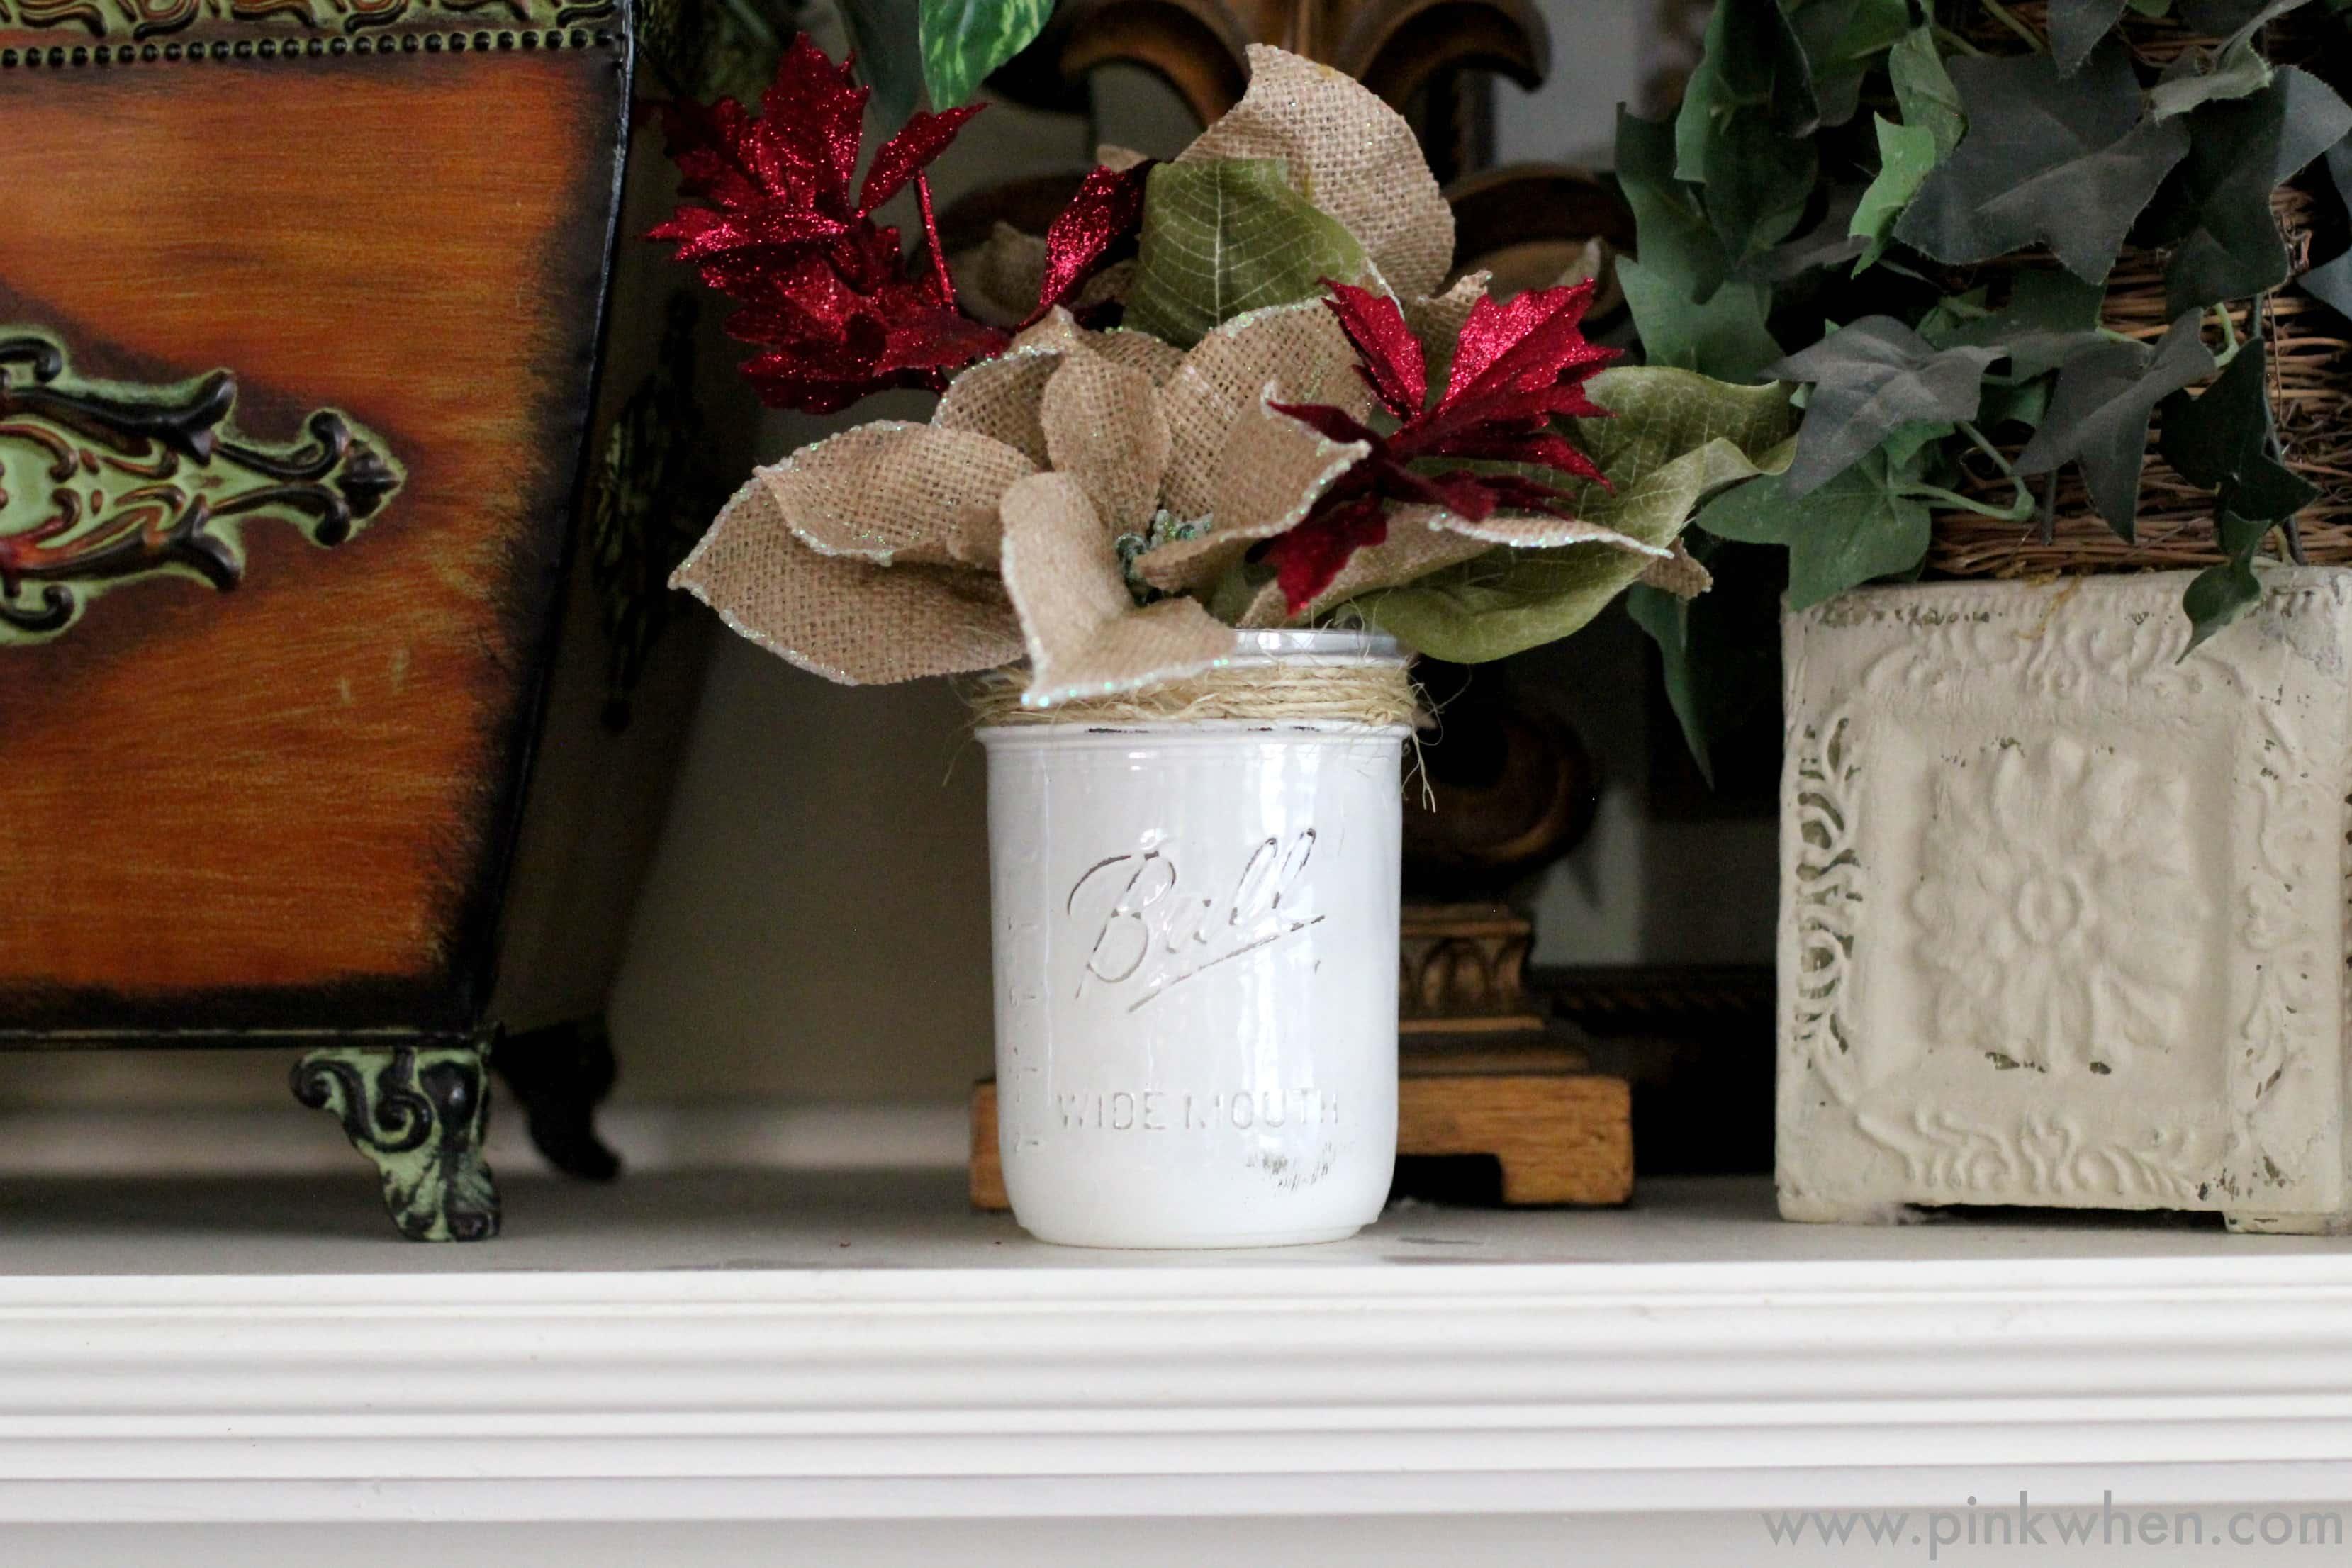 DIY Rustic Christmas Gift Idea #MakeItFunCrafts via PinkWhen.com